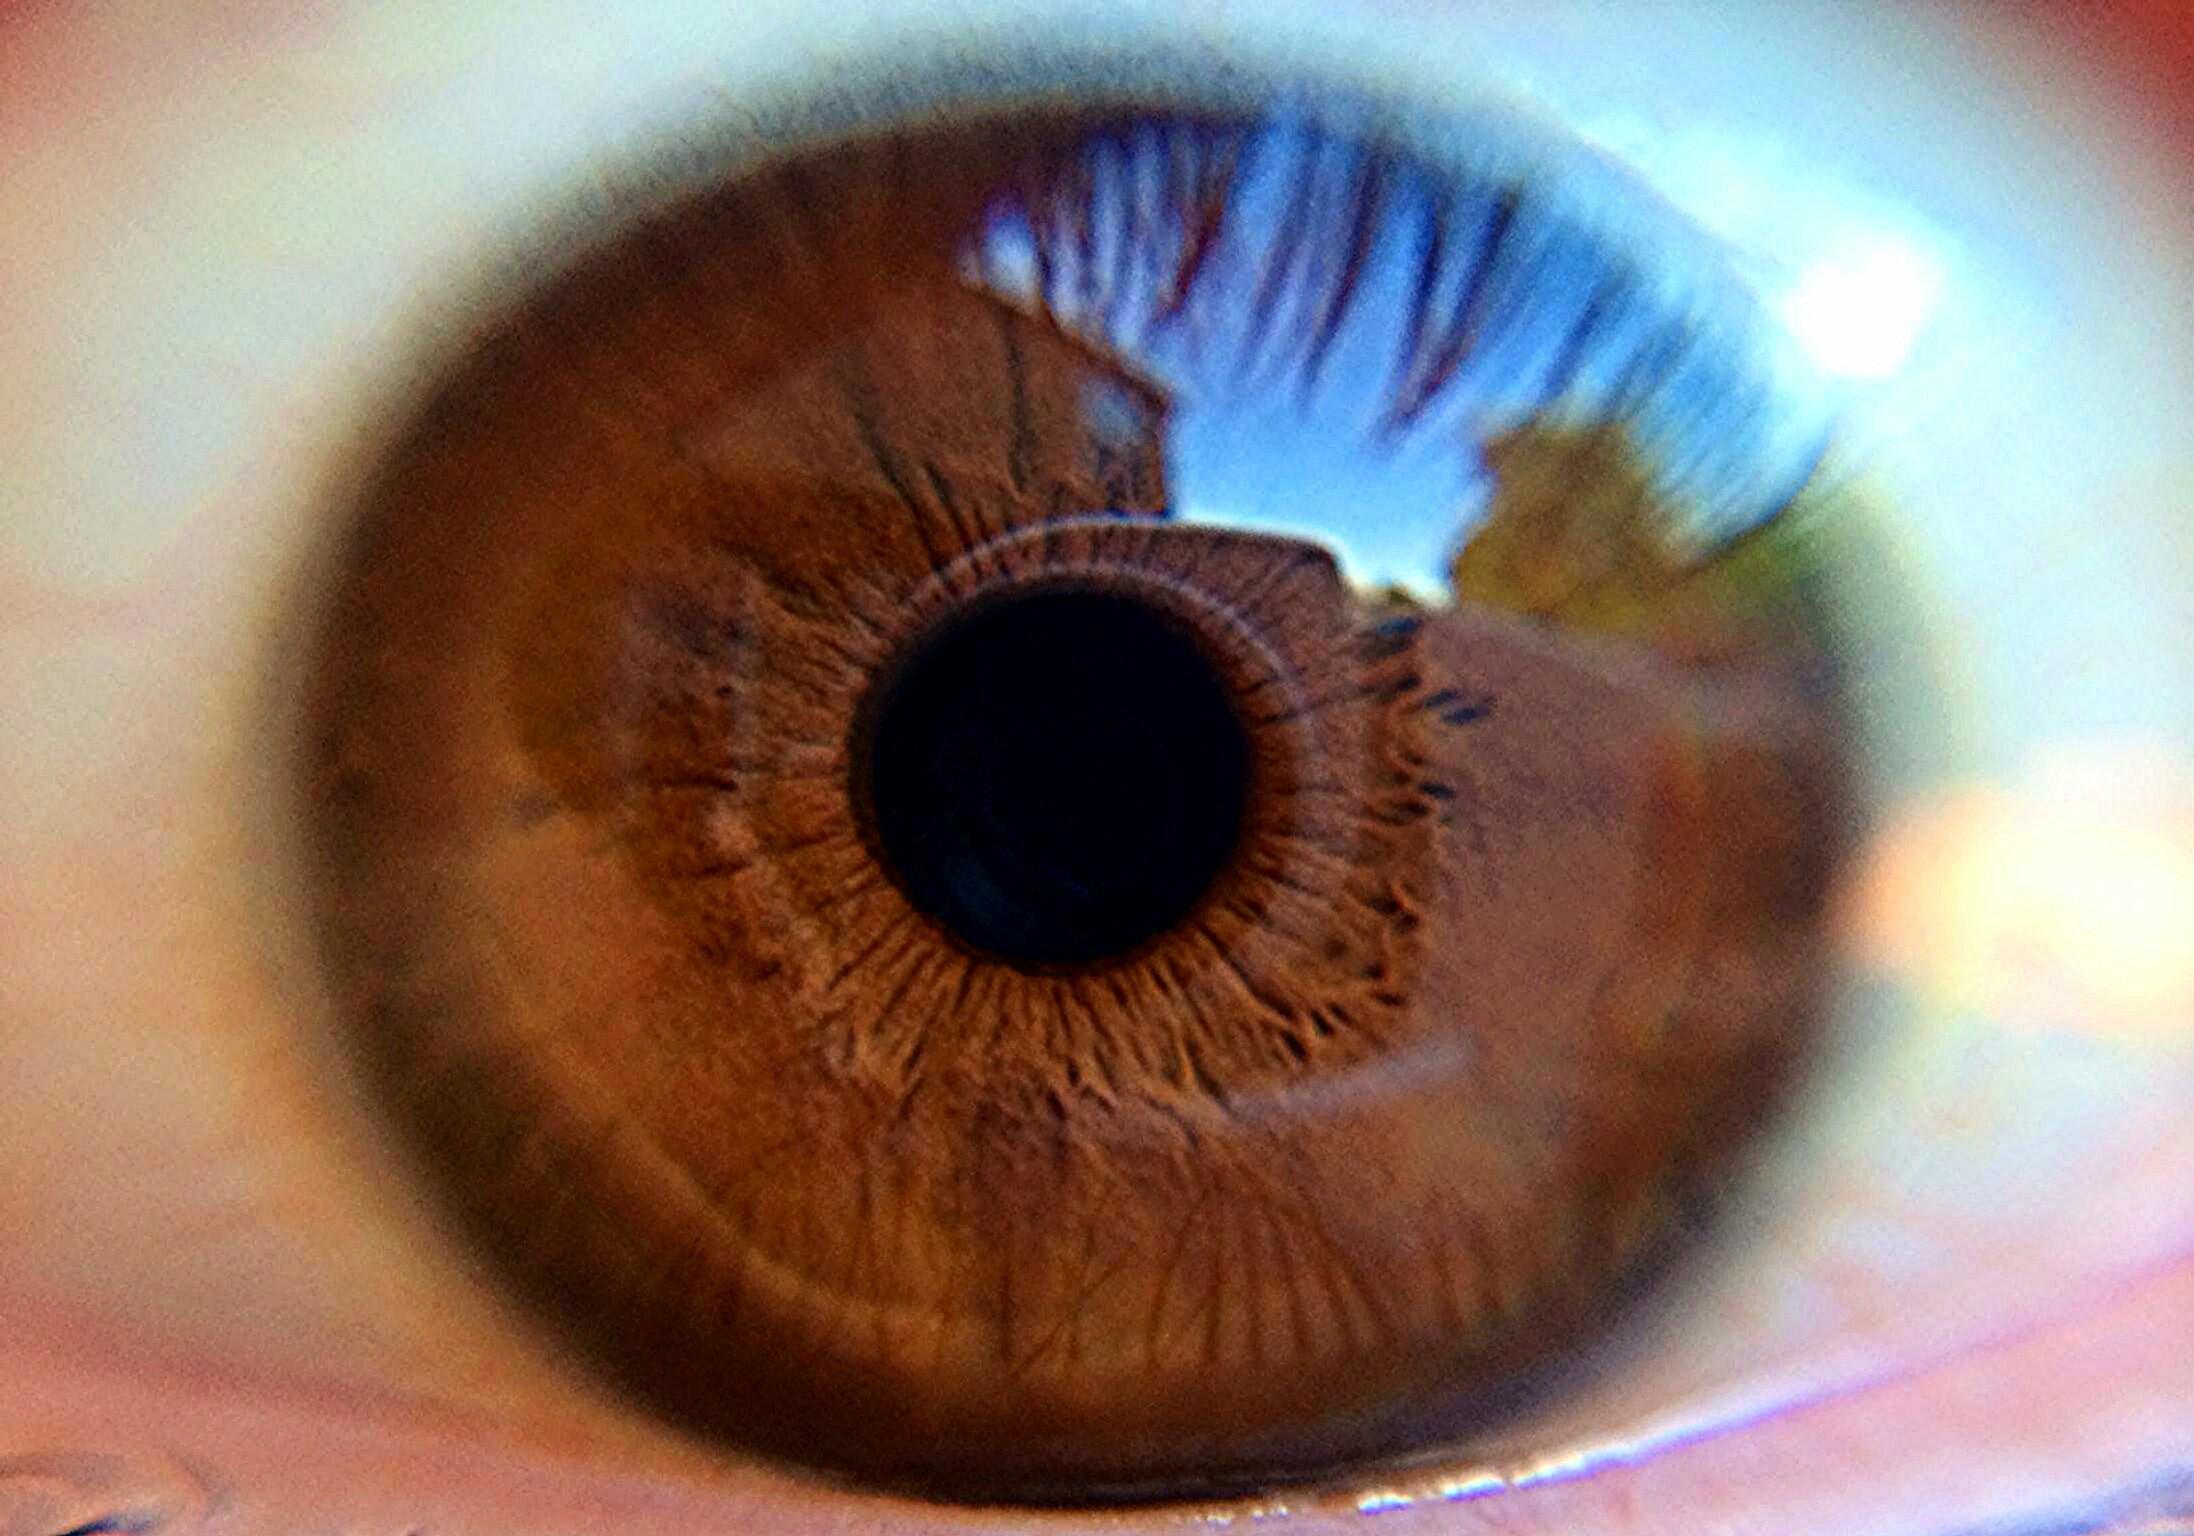 Kontaktlinsen - Nachkontrolle